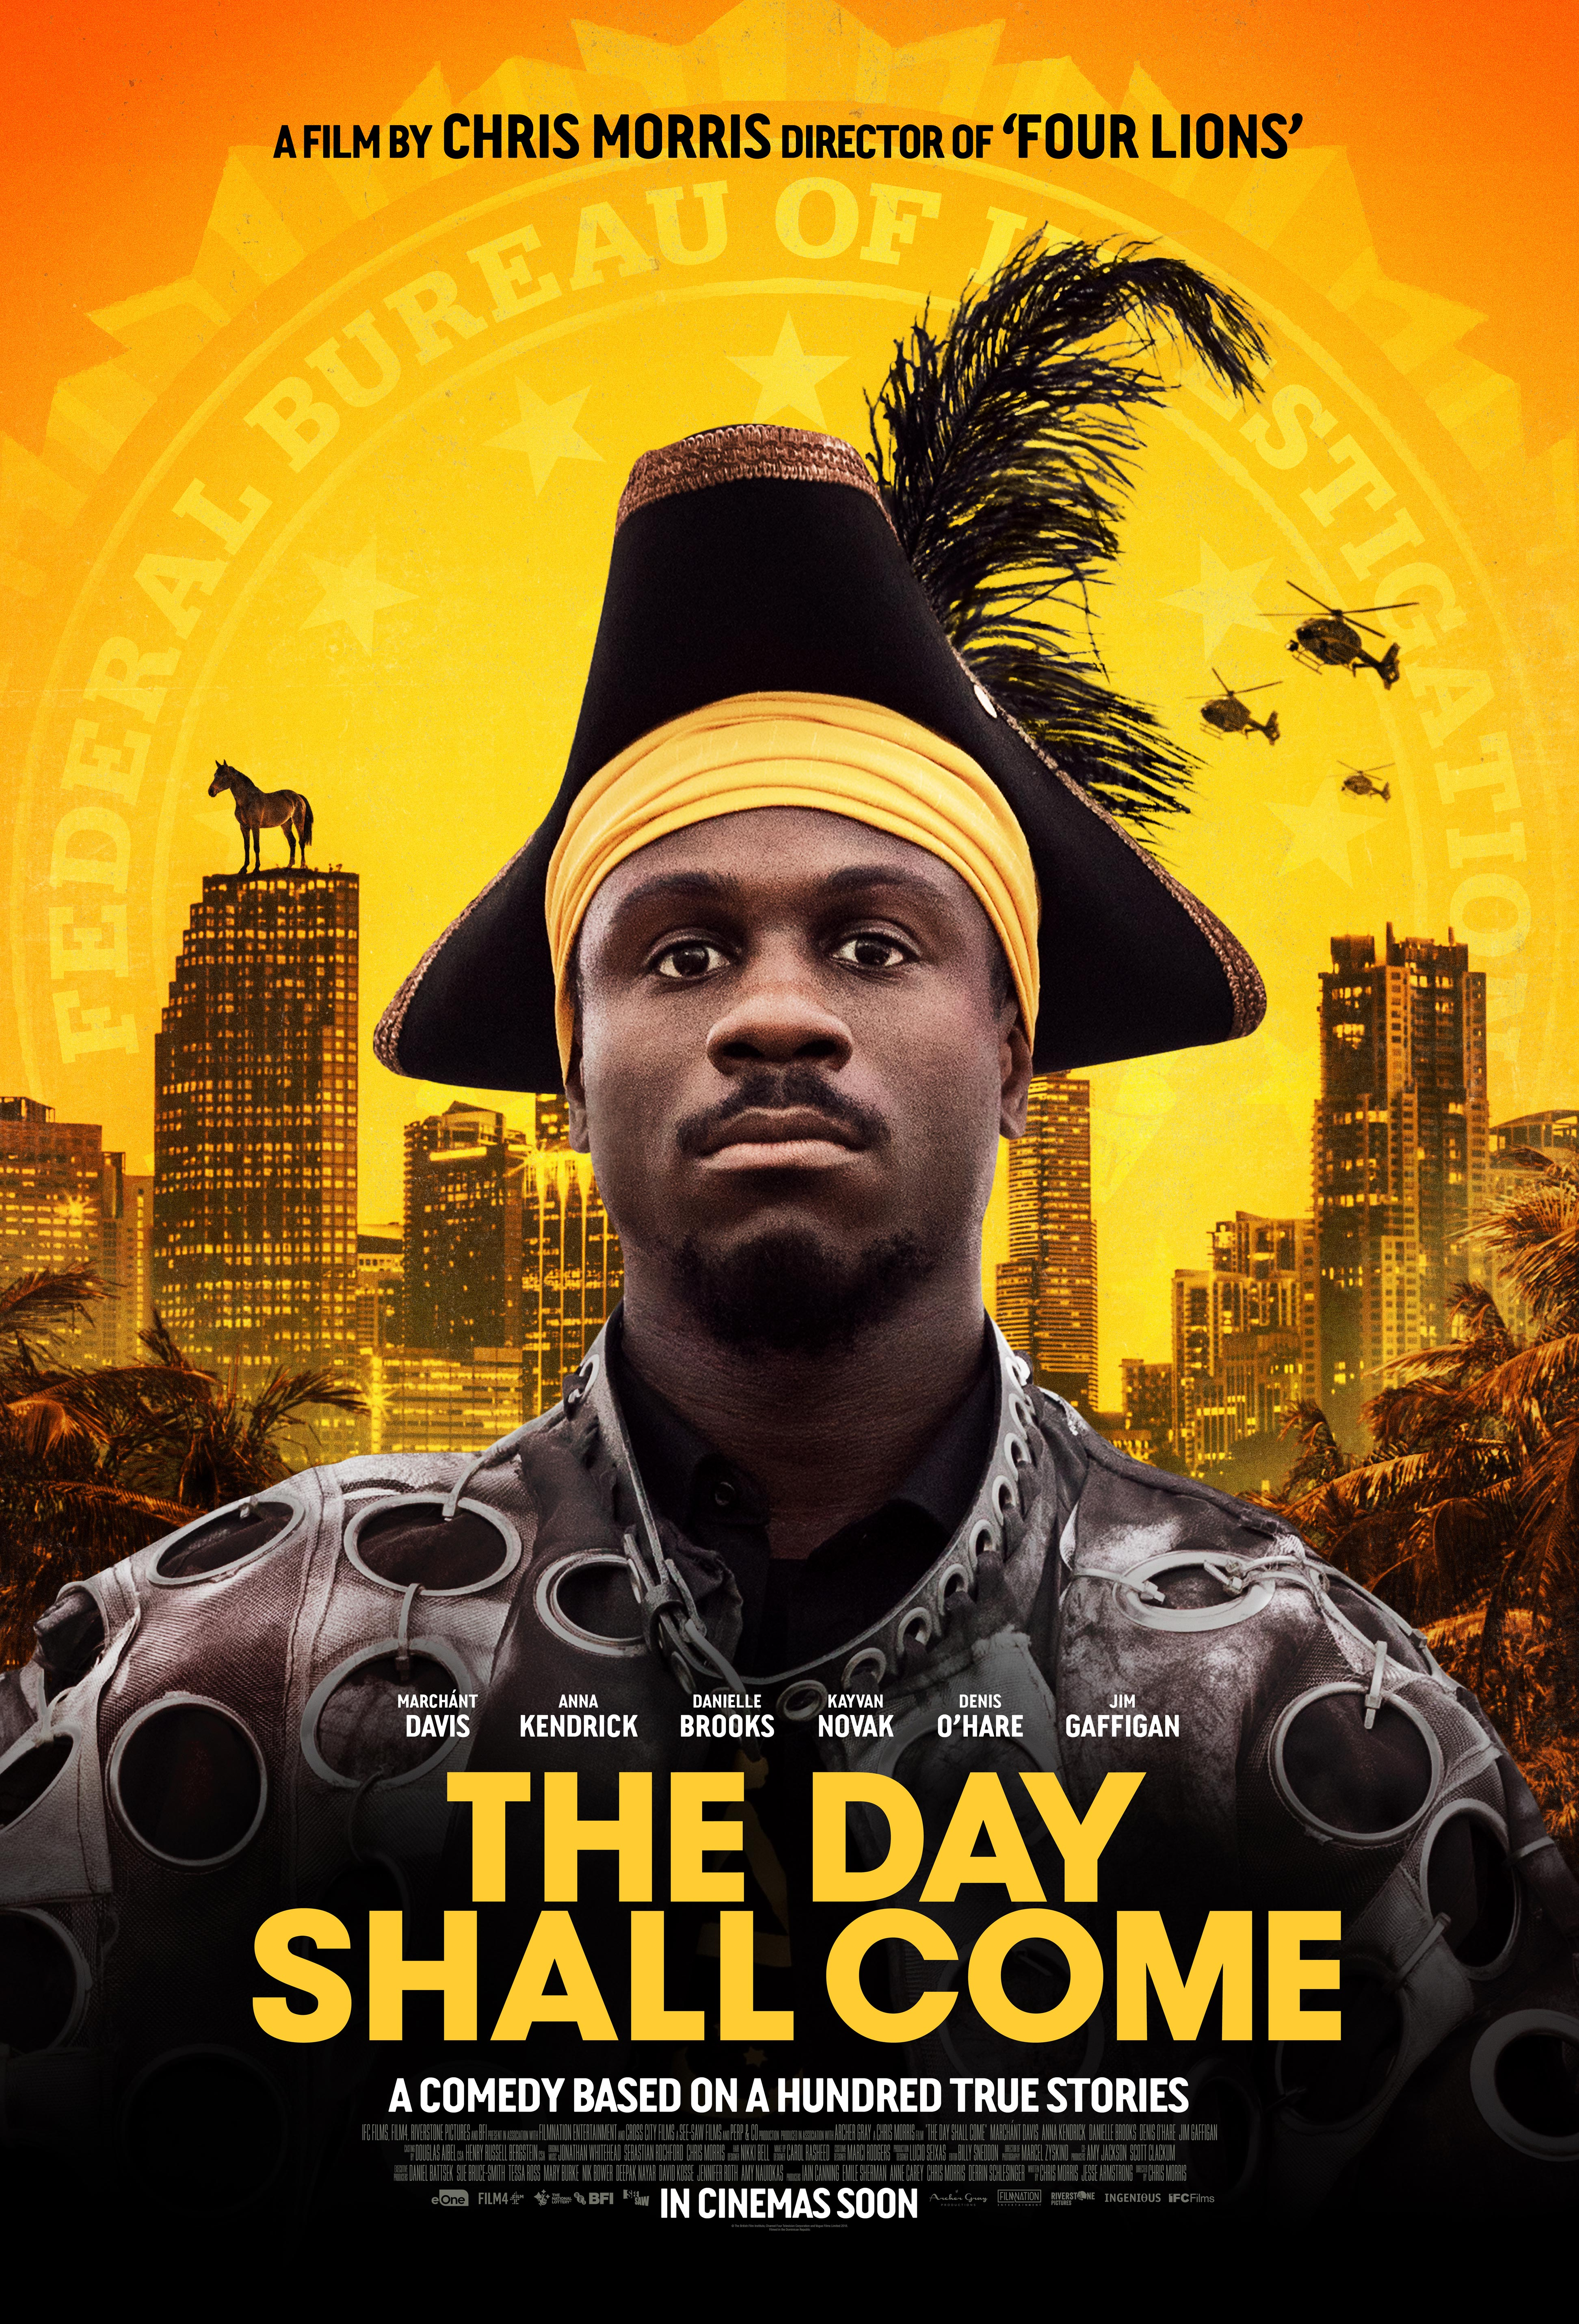 Kai diena ateis (2019) / The Day Shall Come